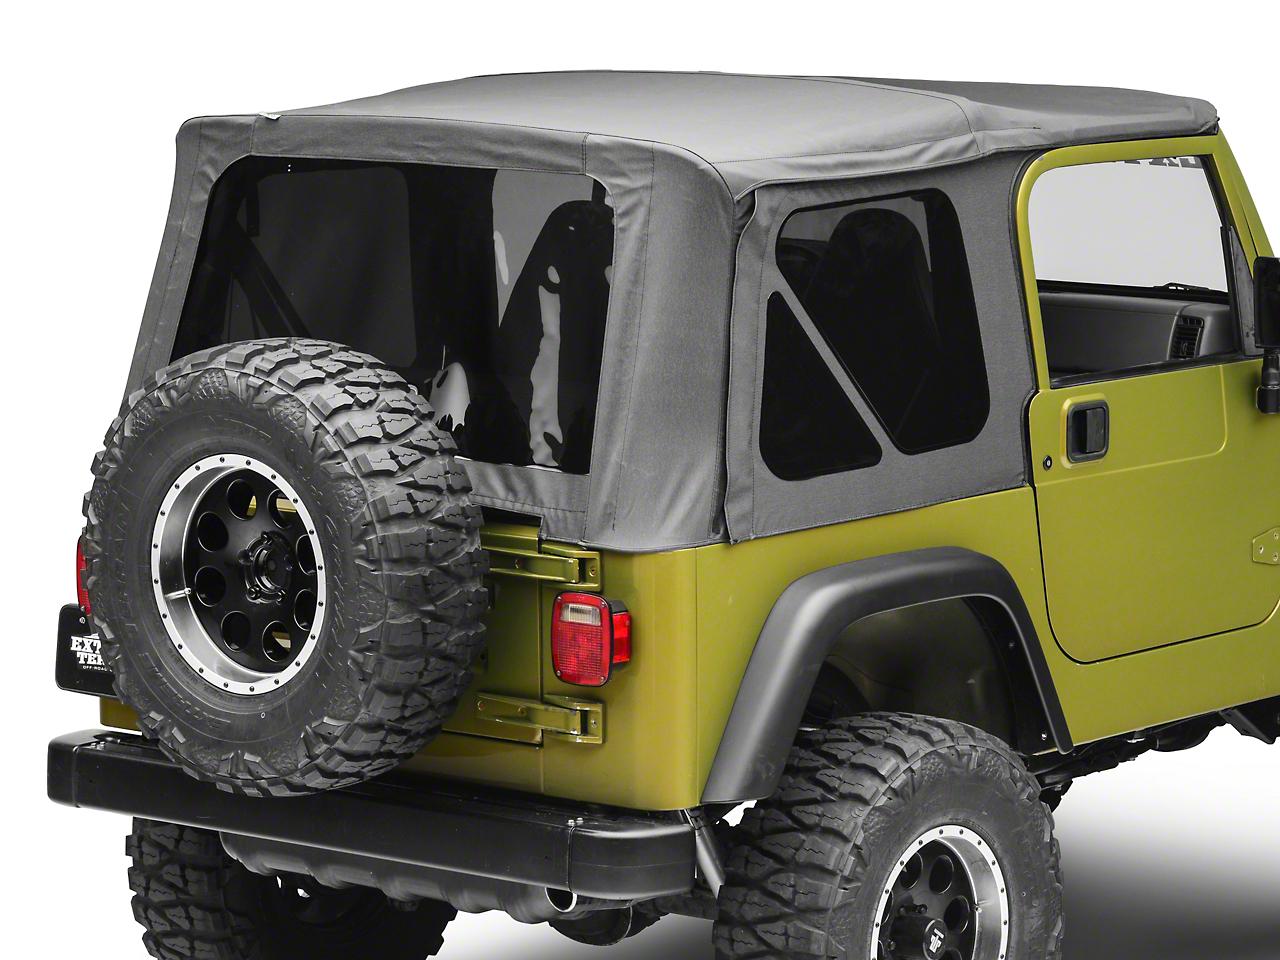 RT Off-Road OEM Replacement Soft Top w/ Tinted Windows & Door Skins - Black Denim (97-06 Wrangler TJ w/ Full Steel Doors)